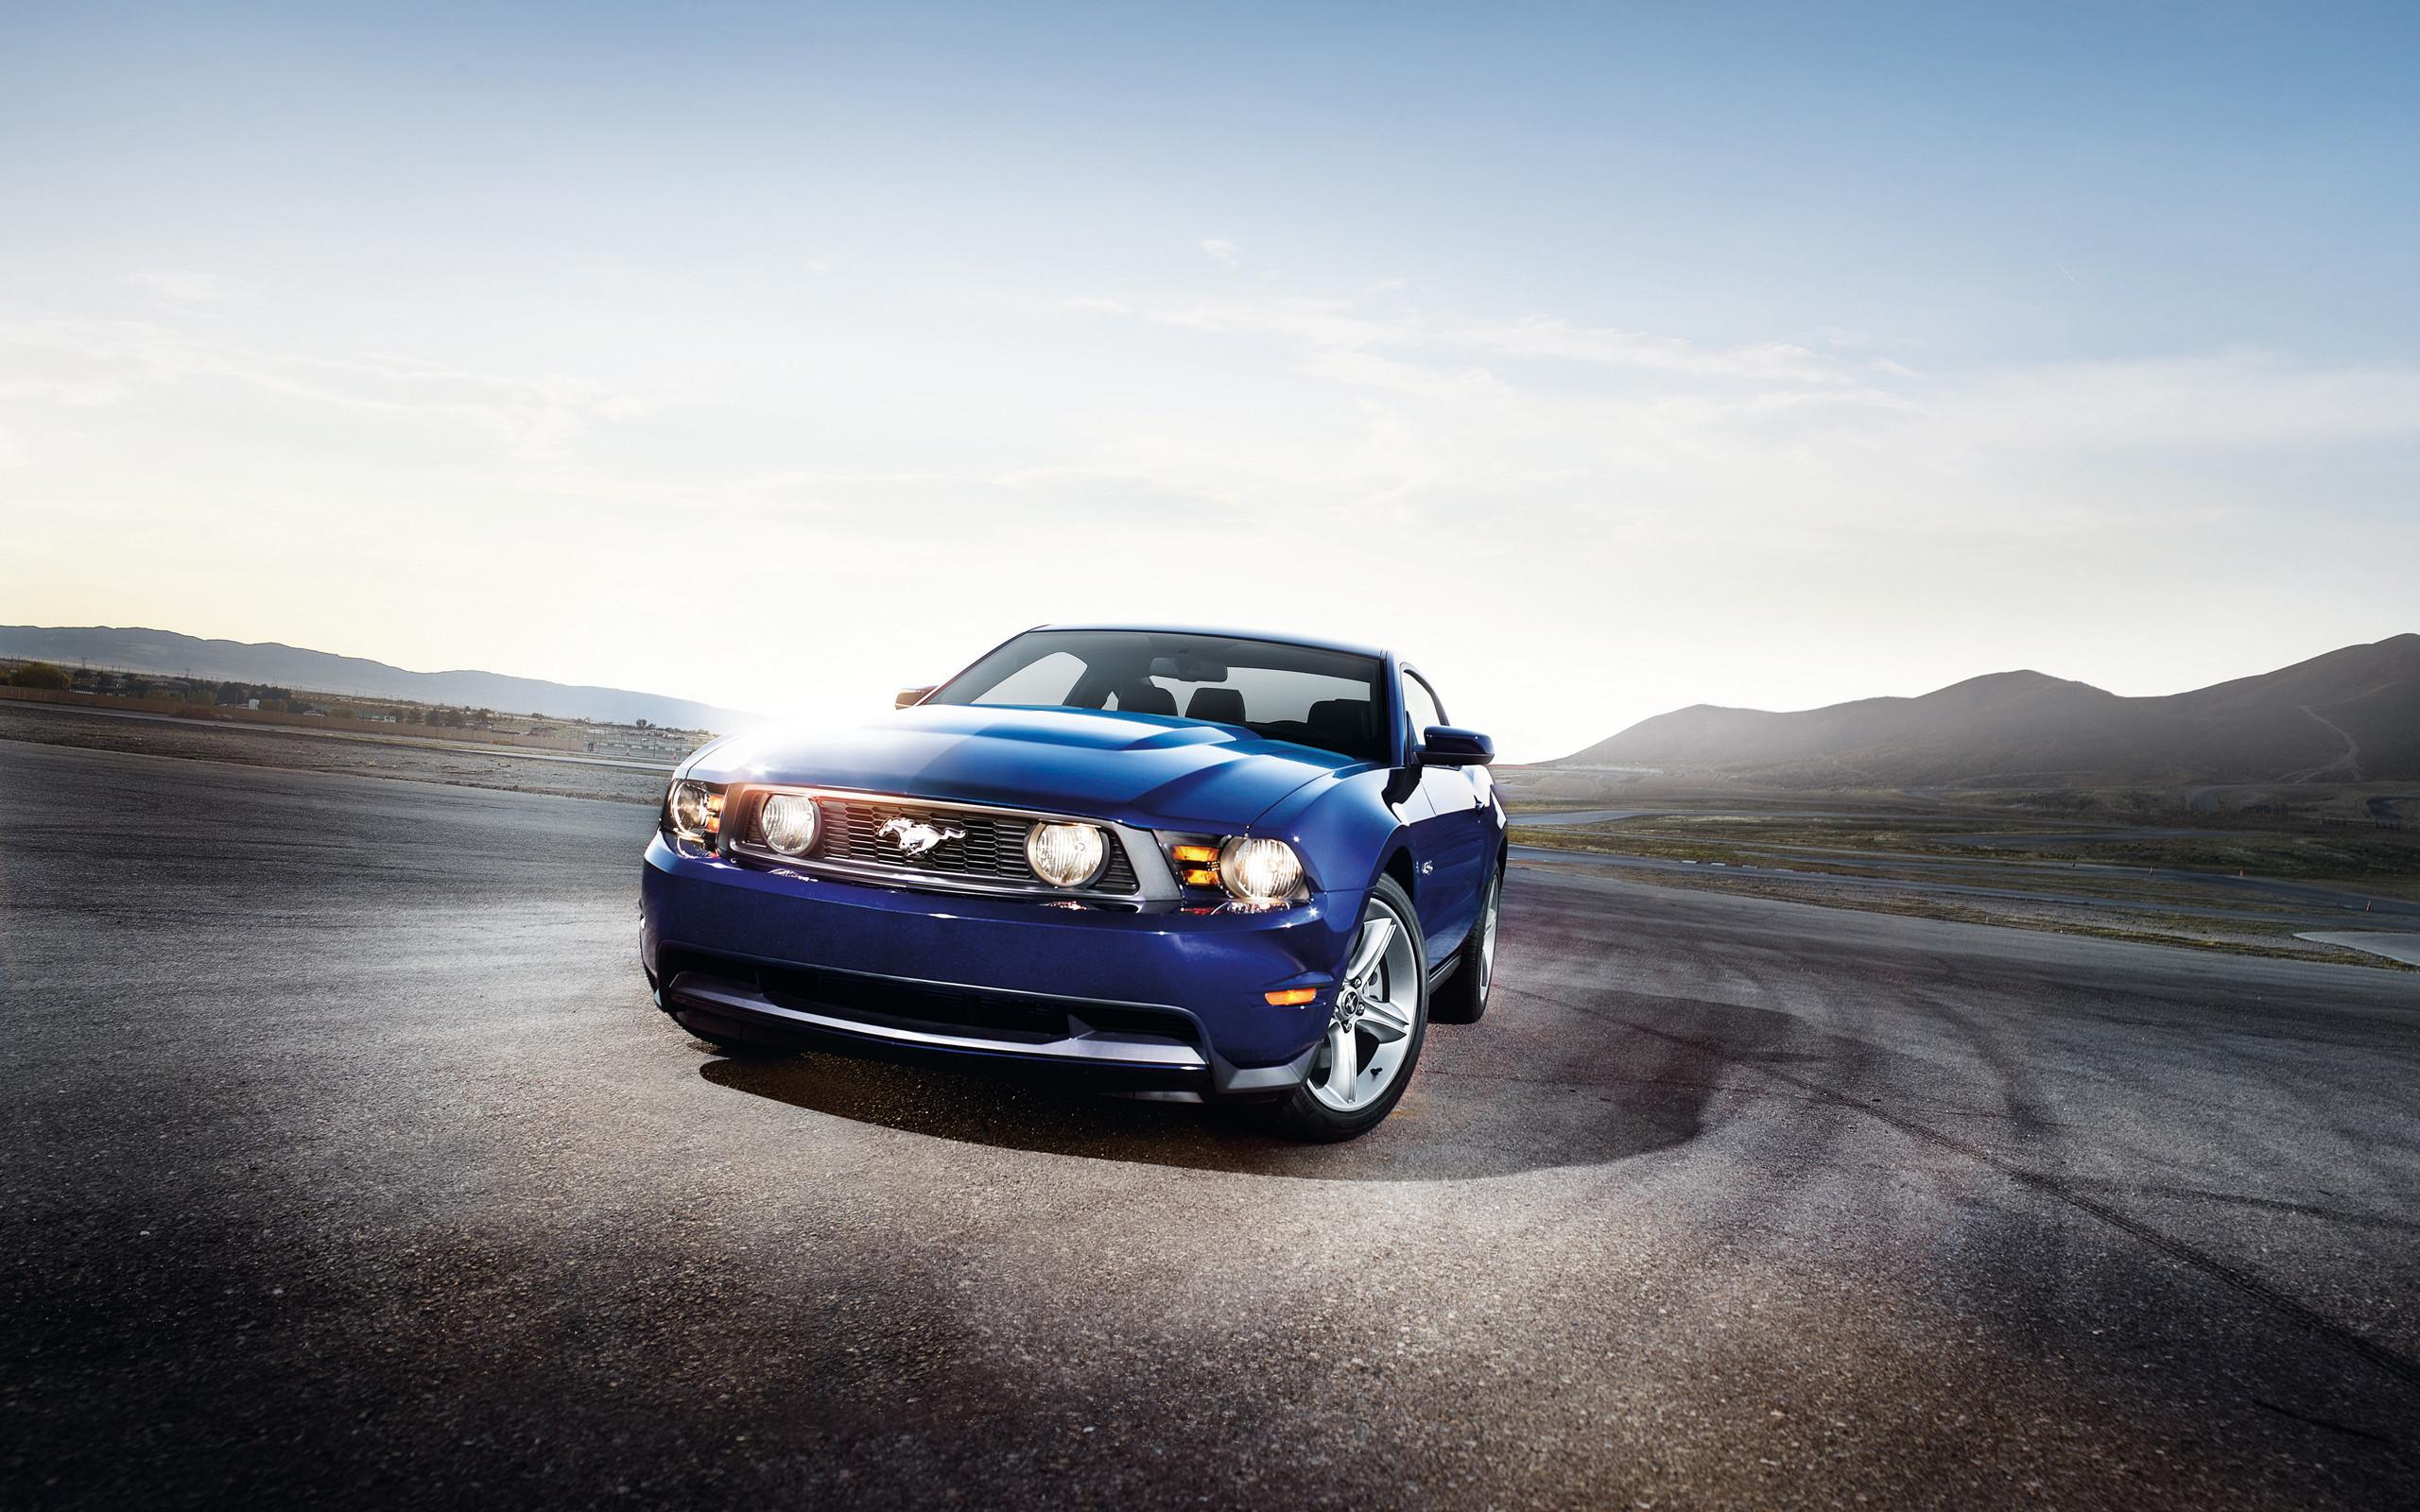 Wallpaper hd: Ford Mustang Shelby GT500 2012   Cars Radar